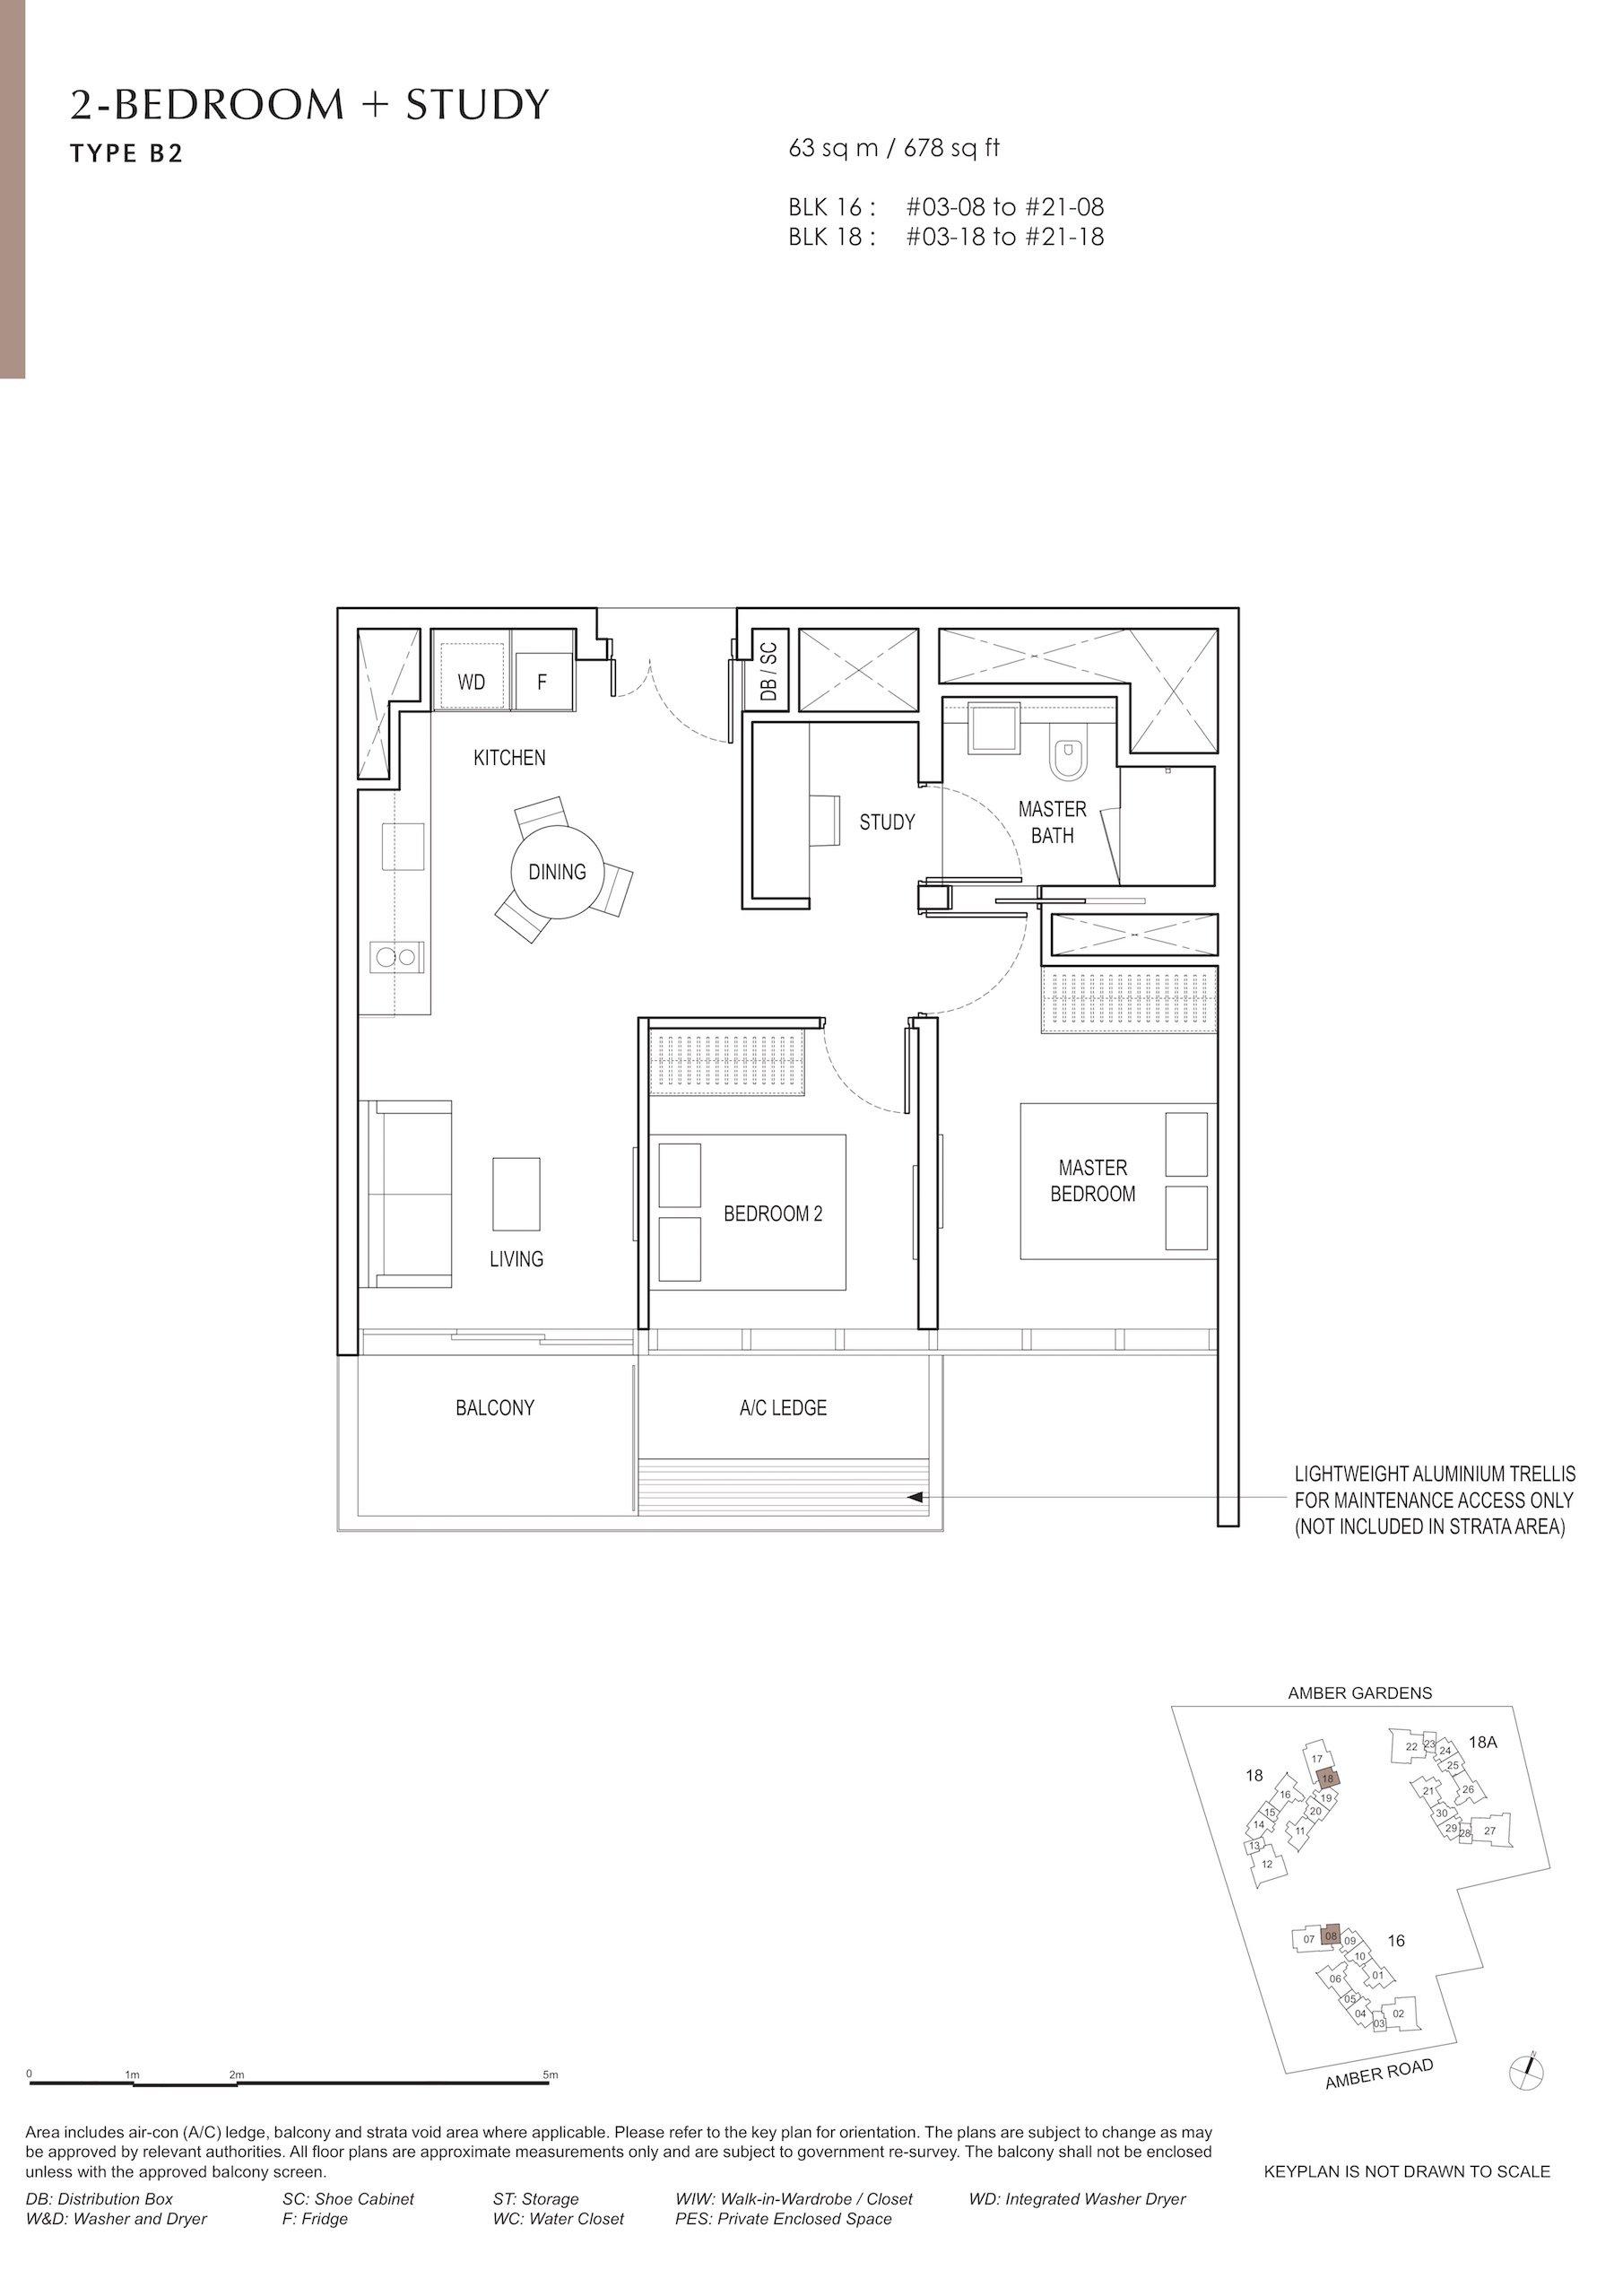 Amber Park 安铂苑 floor plan 2 bedroom + study 2卧房+书房 B2